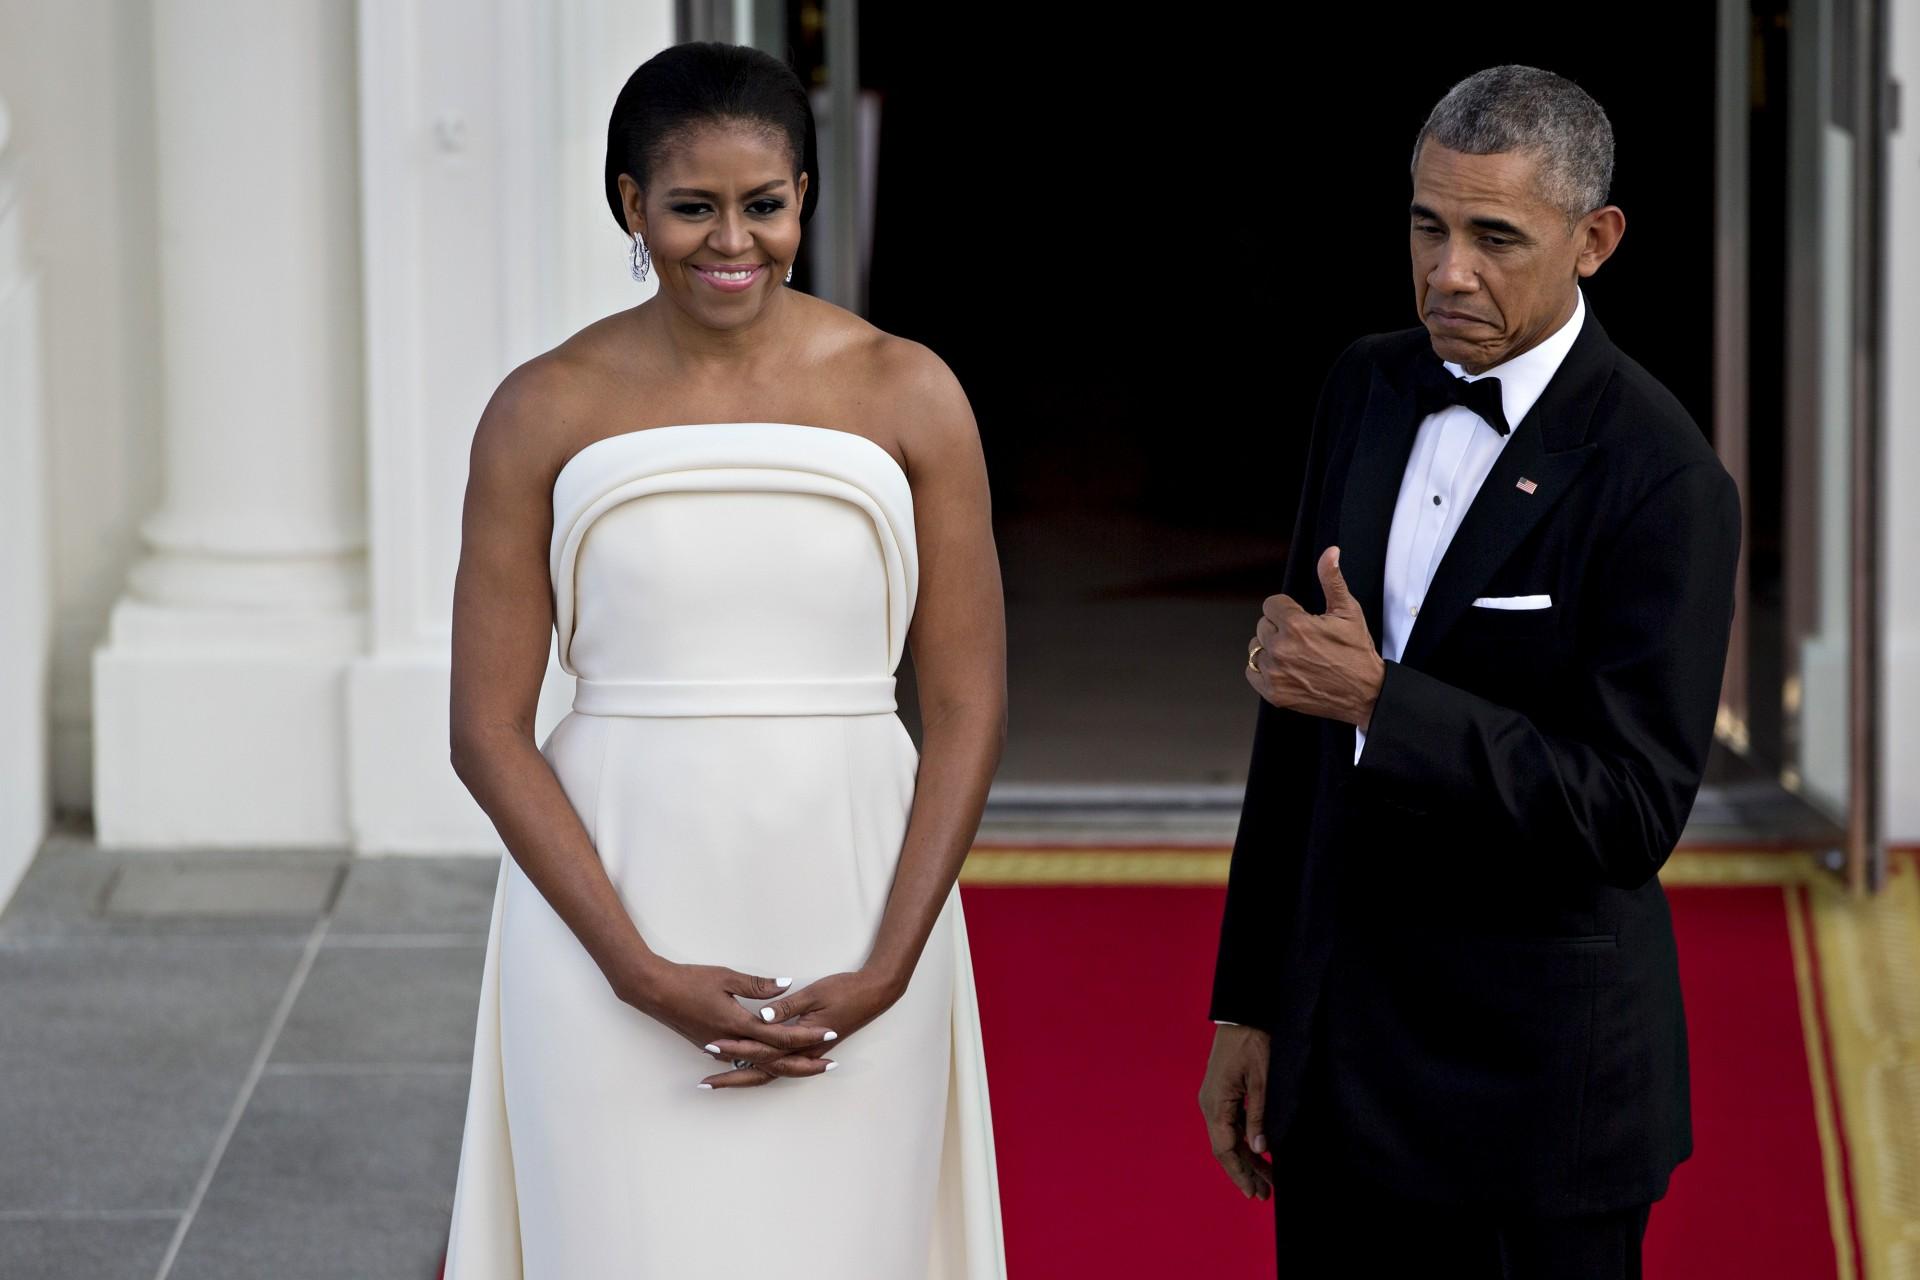 021 Barack Obama Feminism Essay Marvelous President Research Paper Pdf Michelle 1920